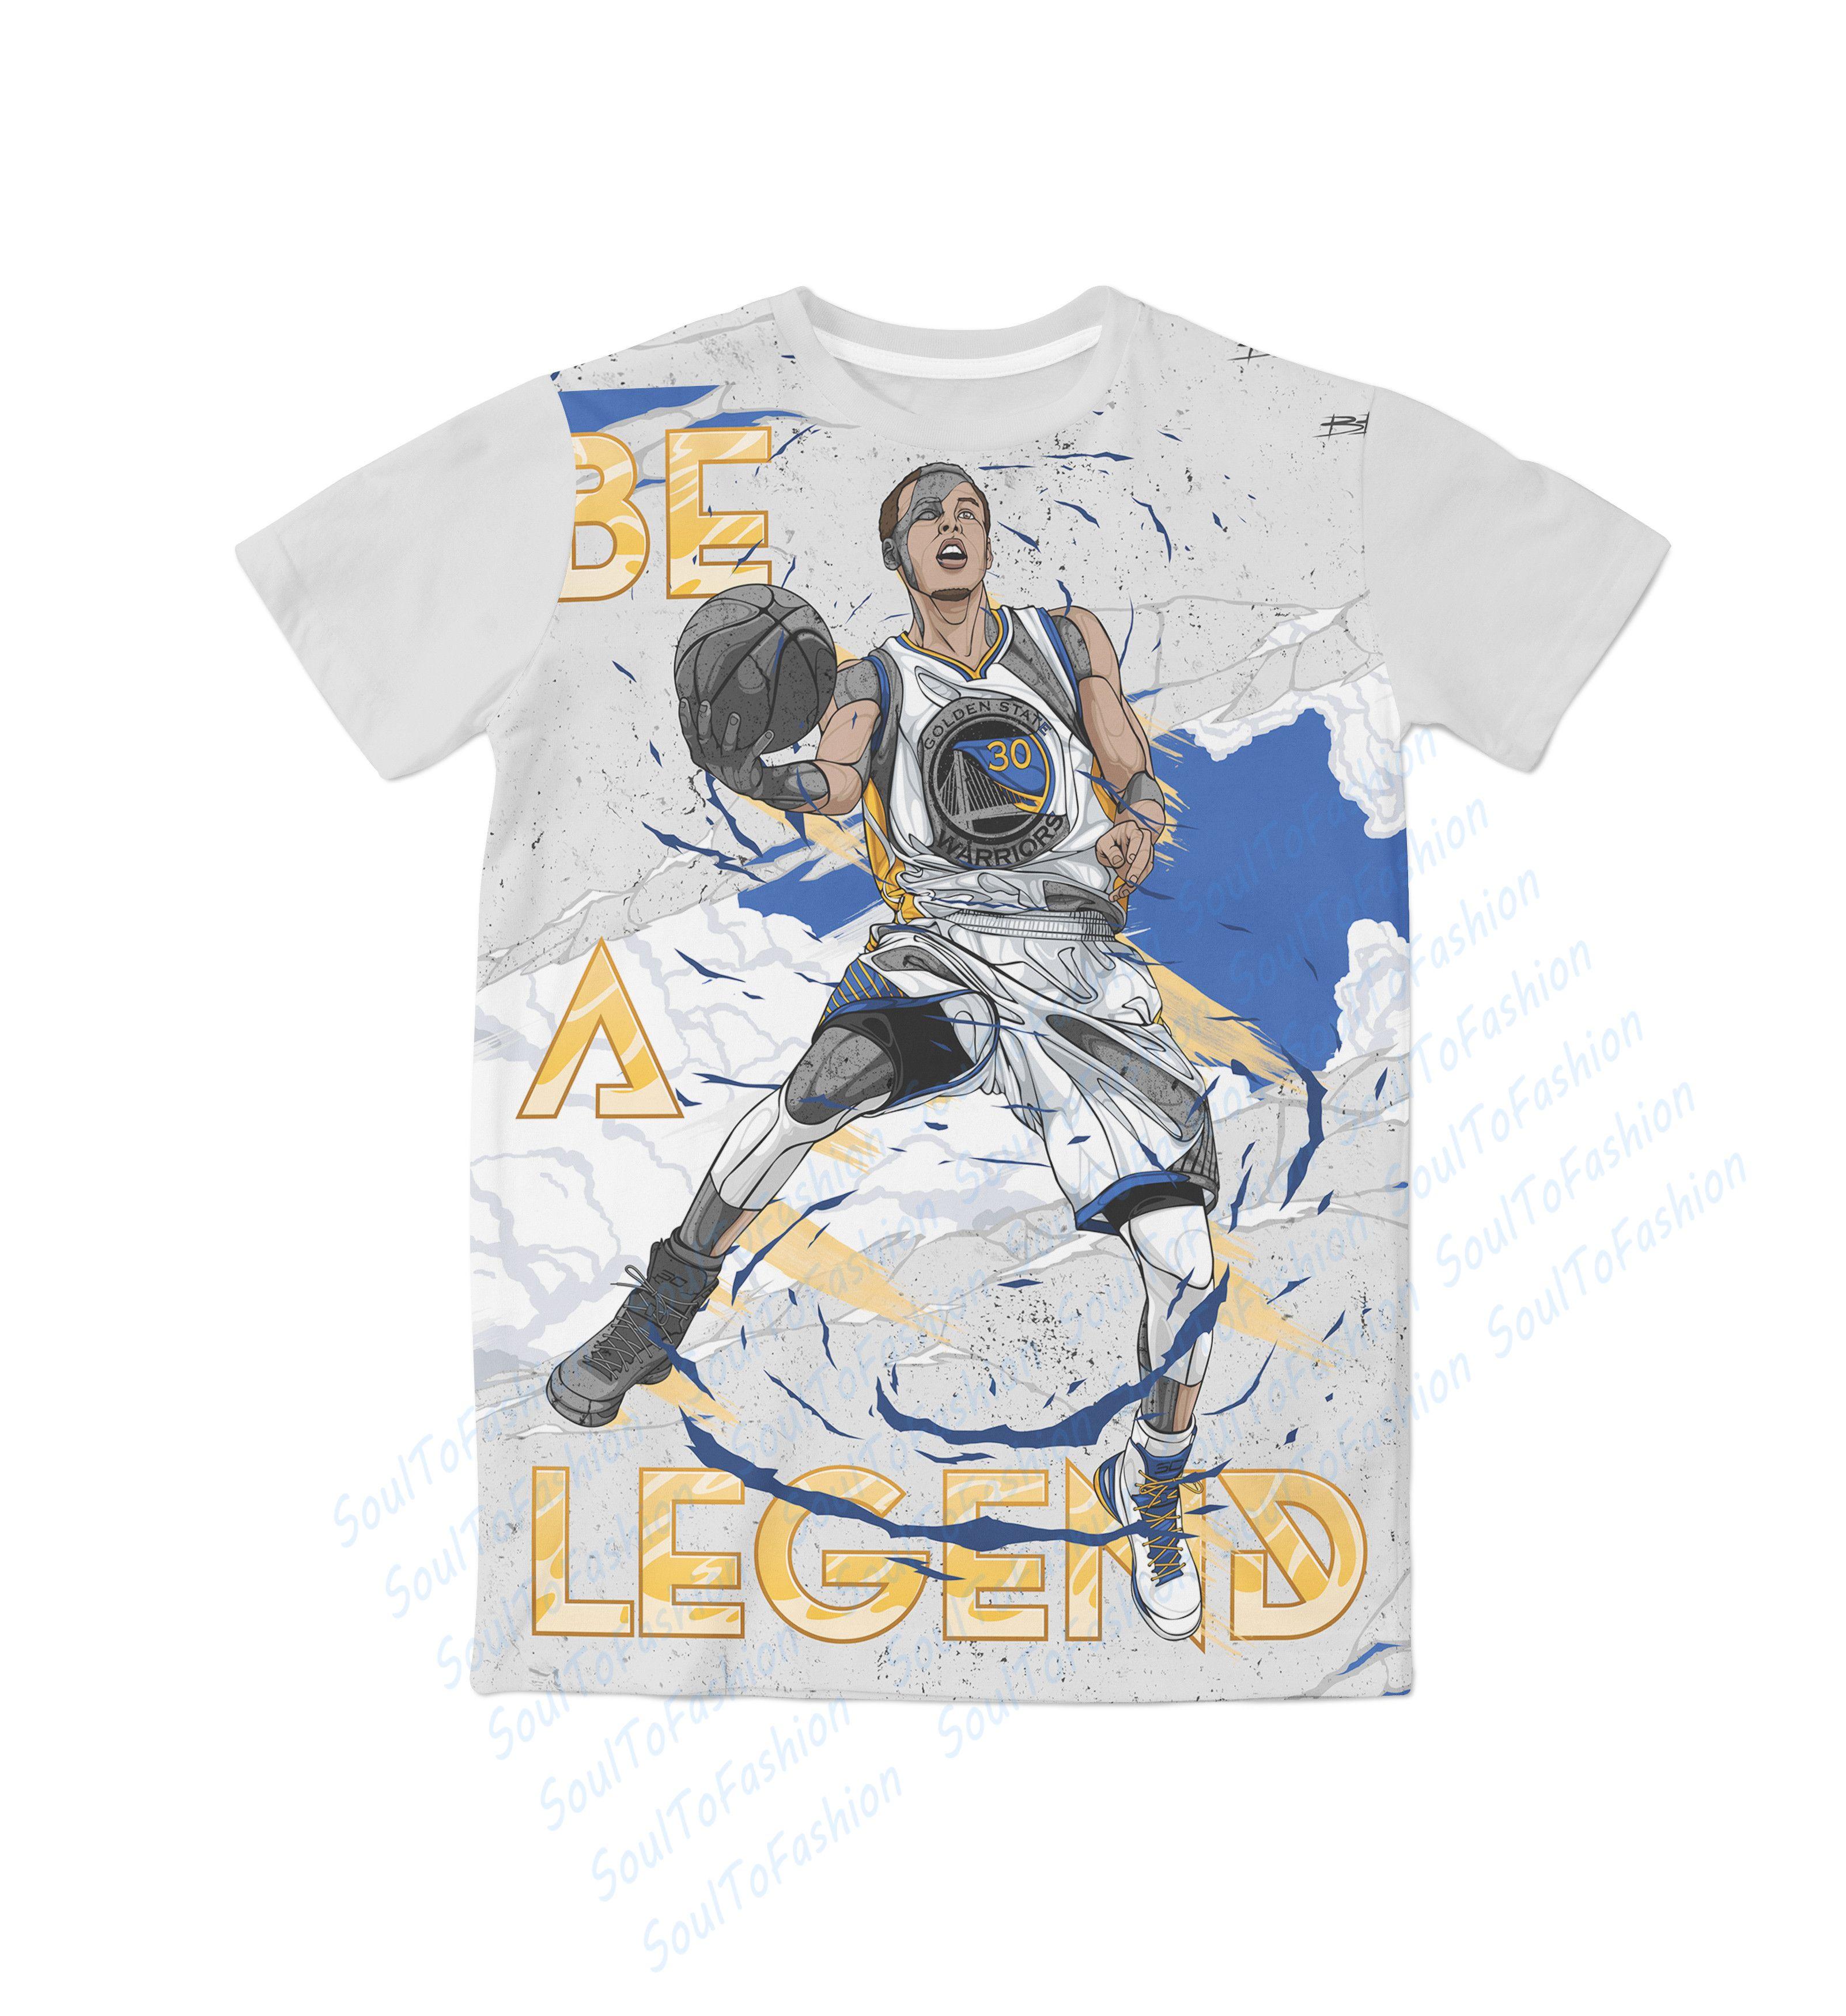 Shirt design usa - Real Usa Size Stephen Curry Be A Legend 3d Sublimation Print T Shirt Plus